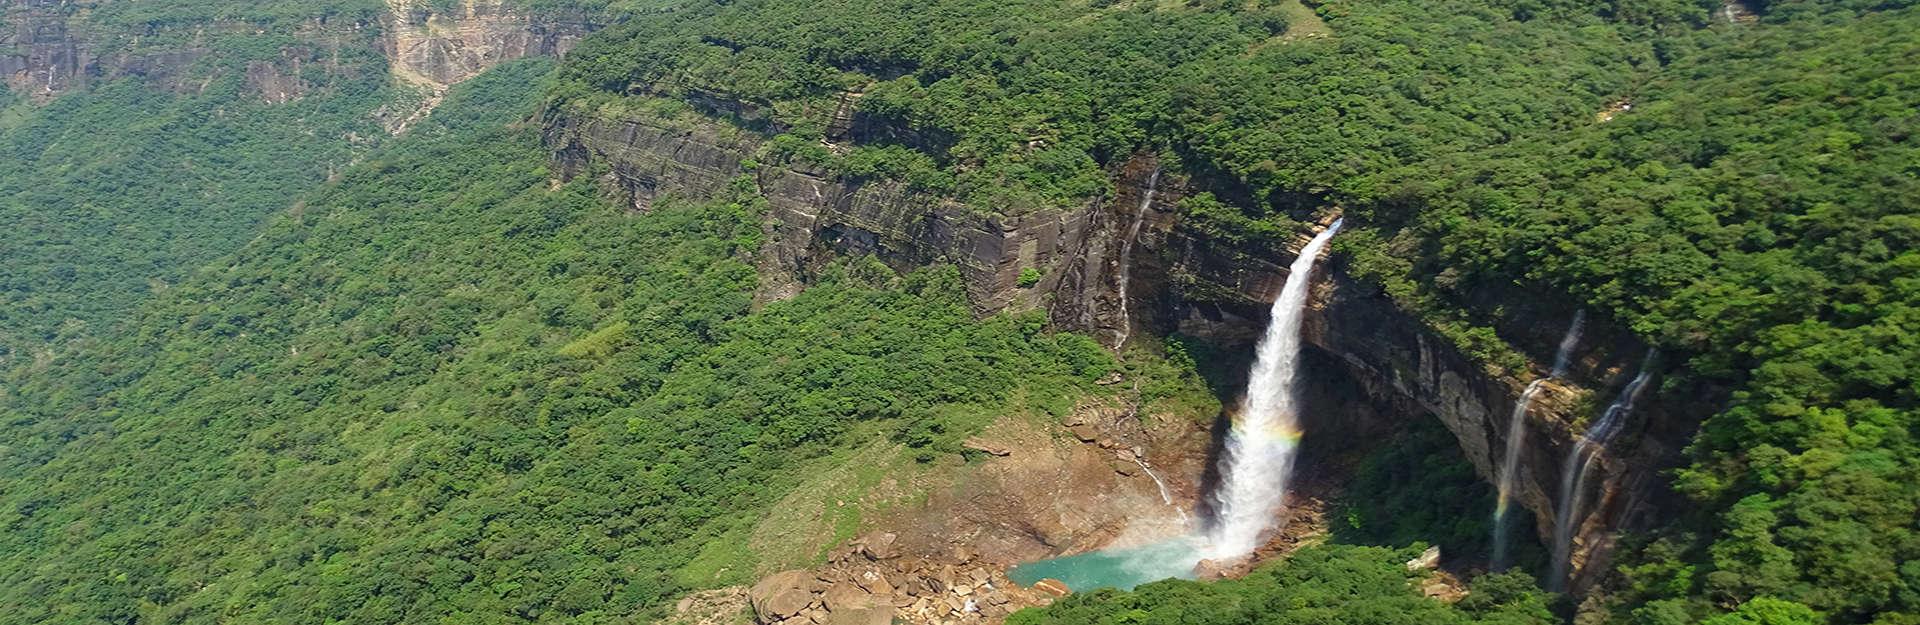 cherrapunjee waterfall